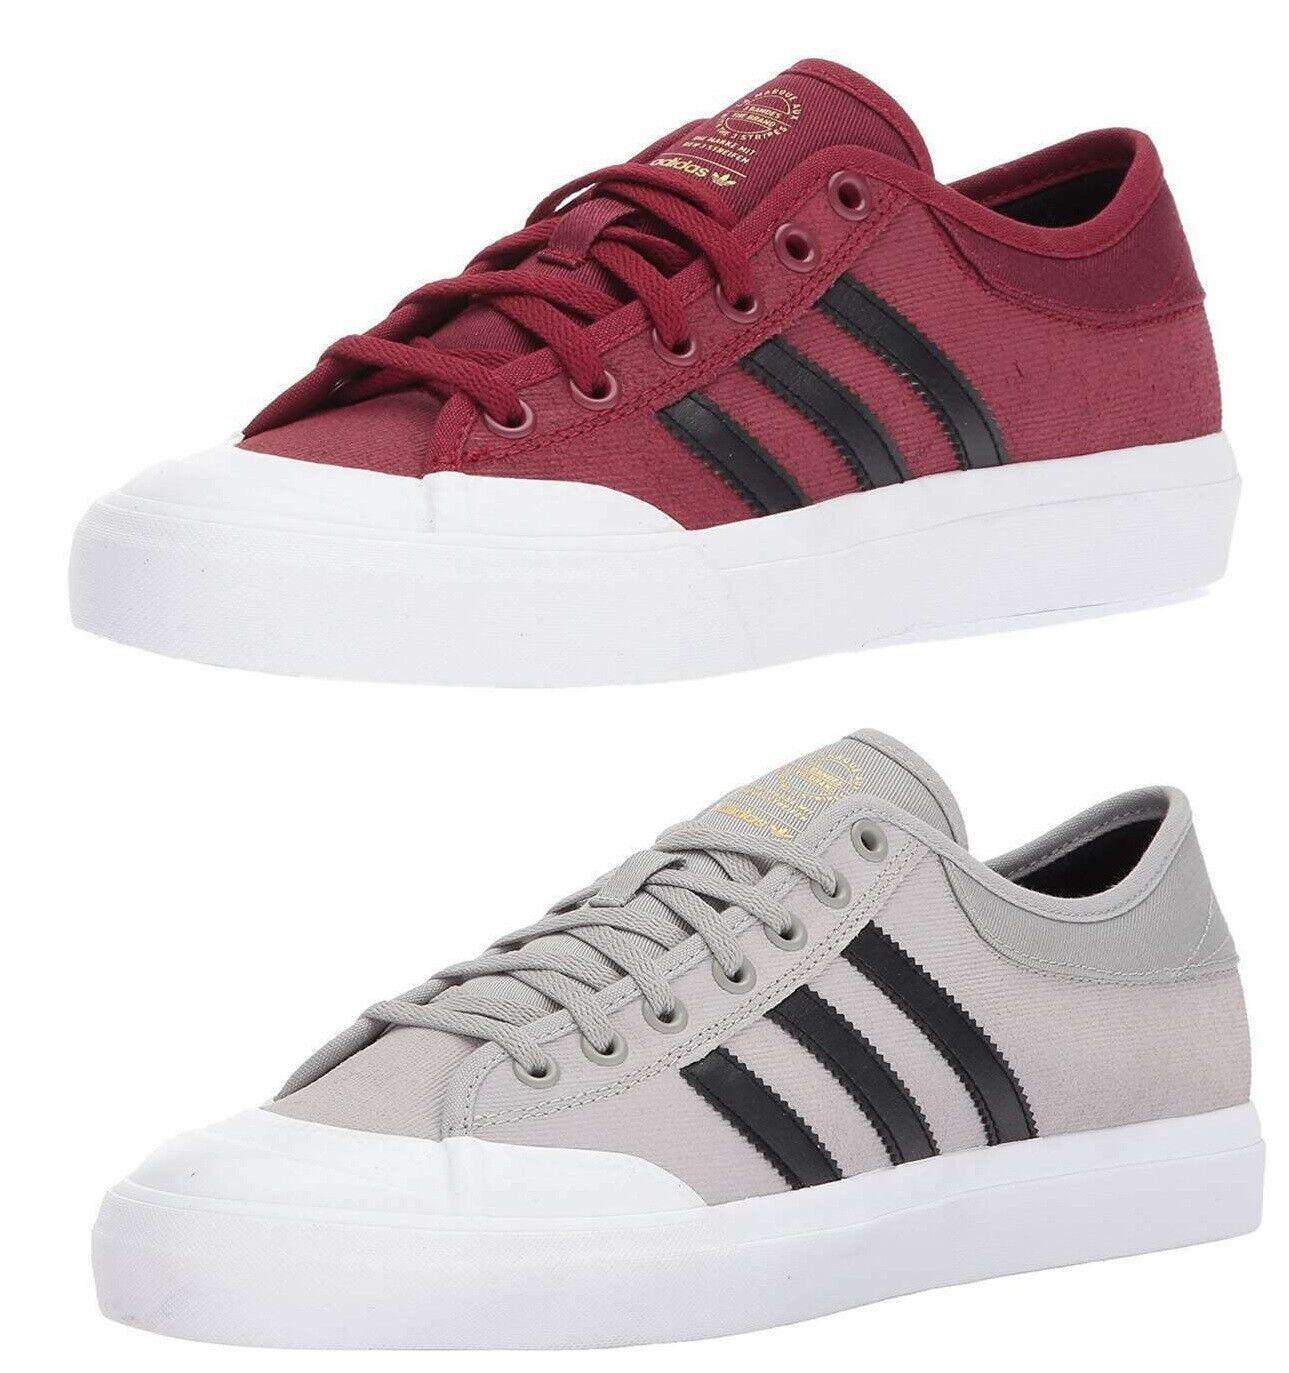 adidas Originals Men's Matchcourt Skateboarding Shoes 3-Stripes Casual Sneakers